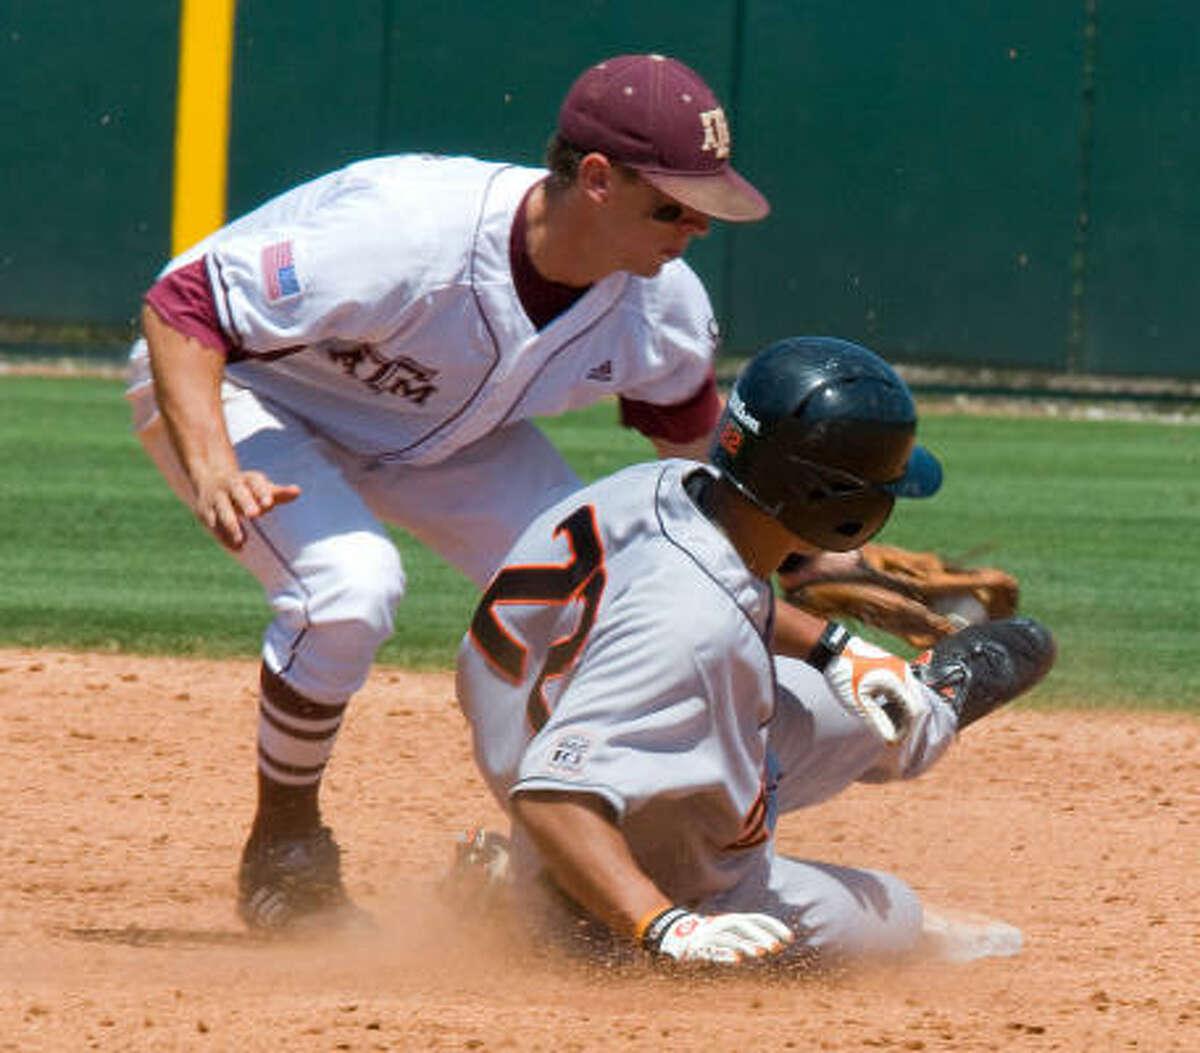 May 29: Oregon State 9, Texas A&M 8 Texas A&M's Brodie Greene picks off Oregon State's Koa Kahalehoe at second base.